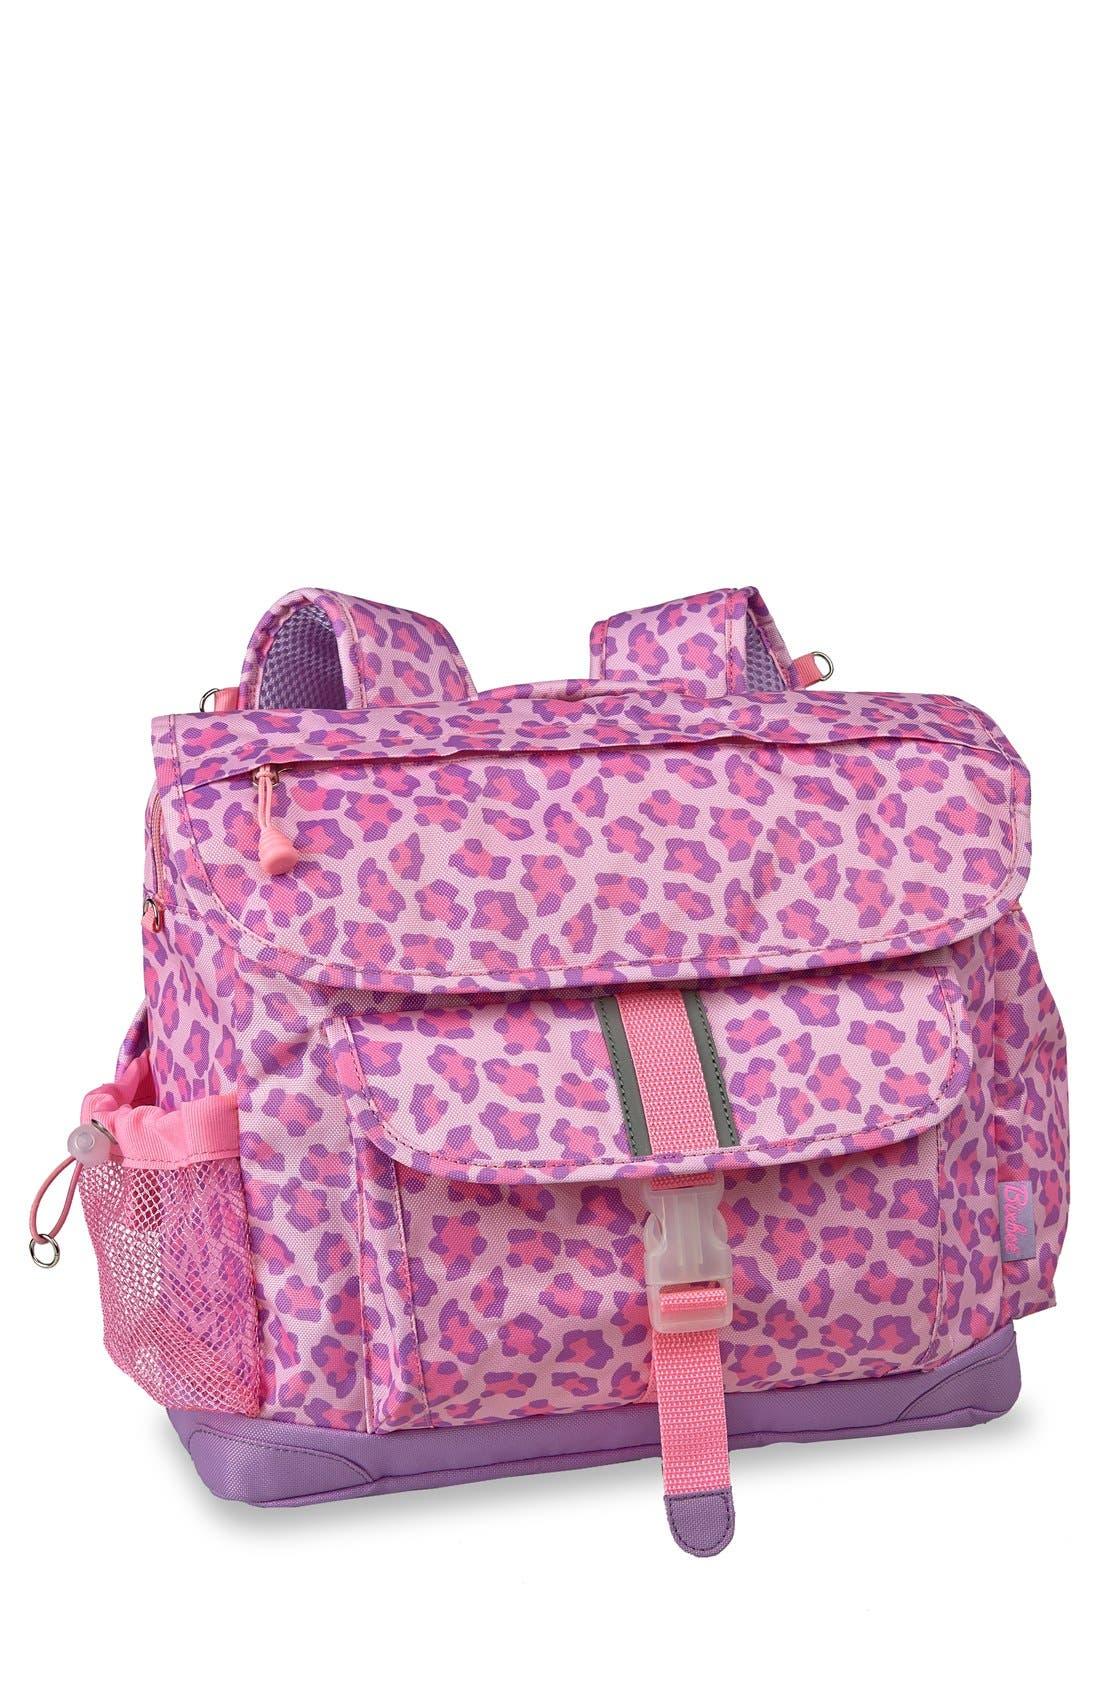 Alternate Image 1 Selected - Bixbee 'Large Sassy Spots' Leopard Print Backpack (Kids)